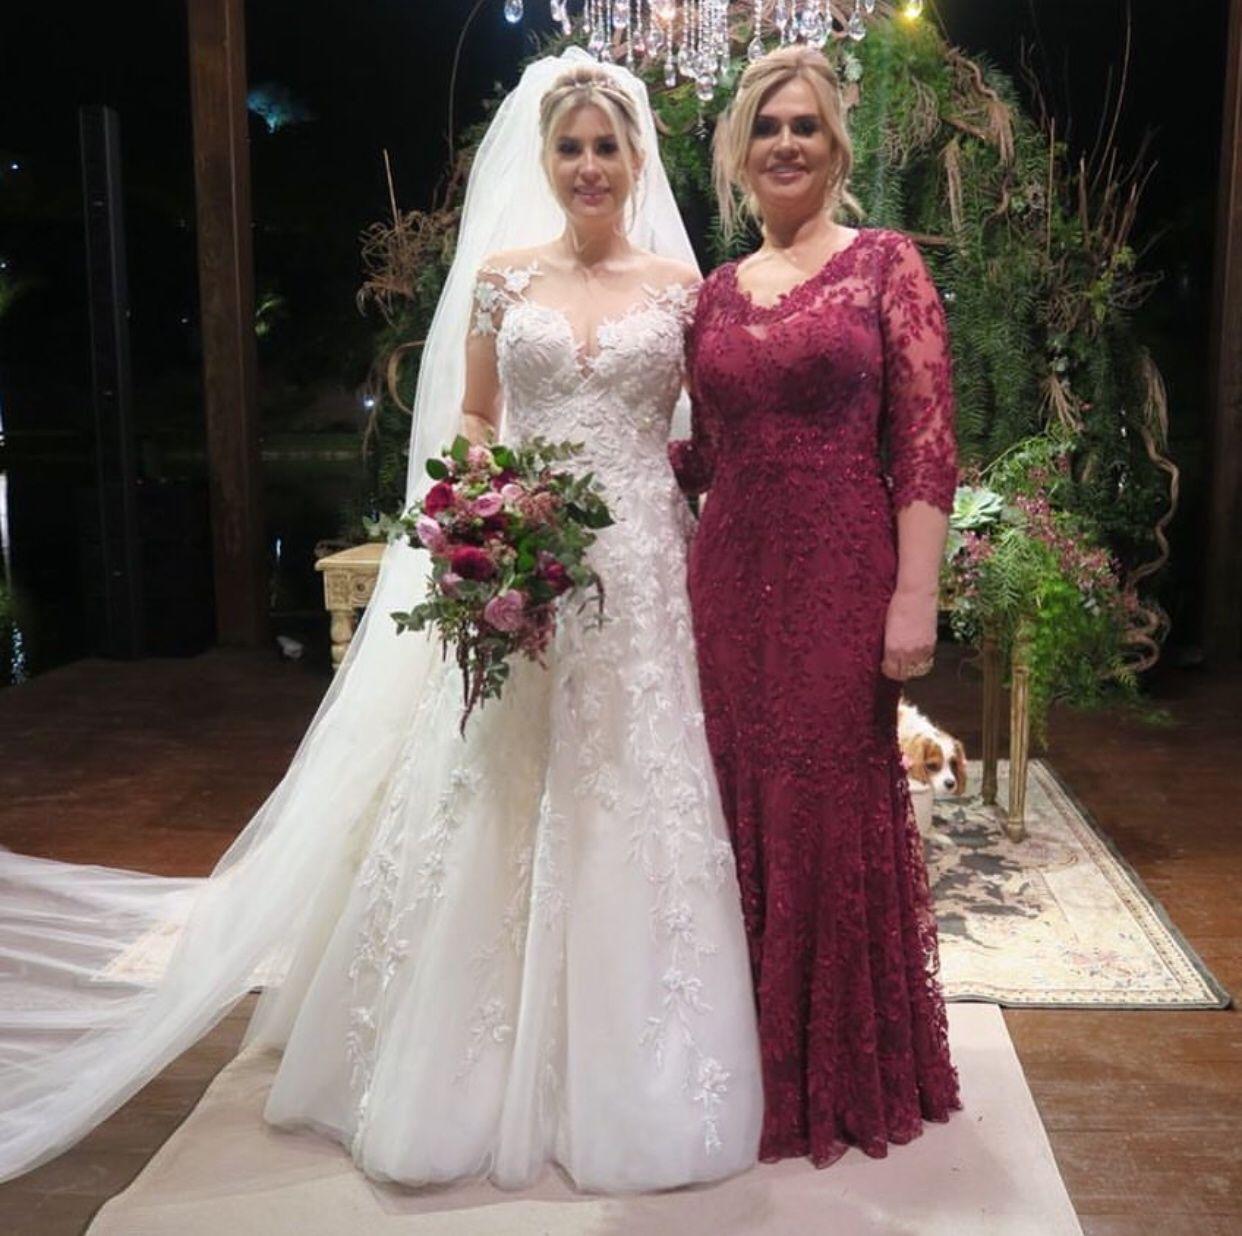 Mãe Da Noiva De Niina Secrets Veste Deslumbrante Vestido